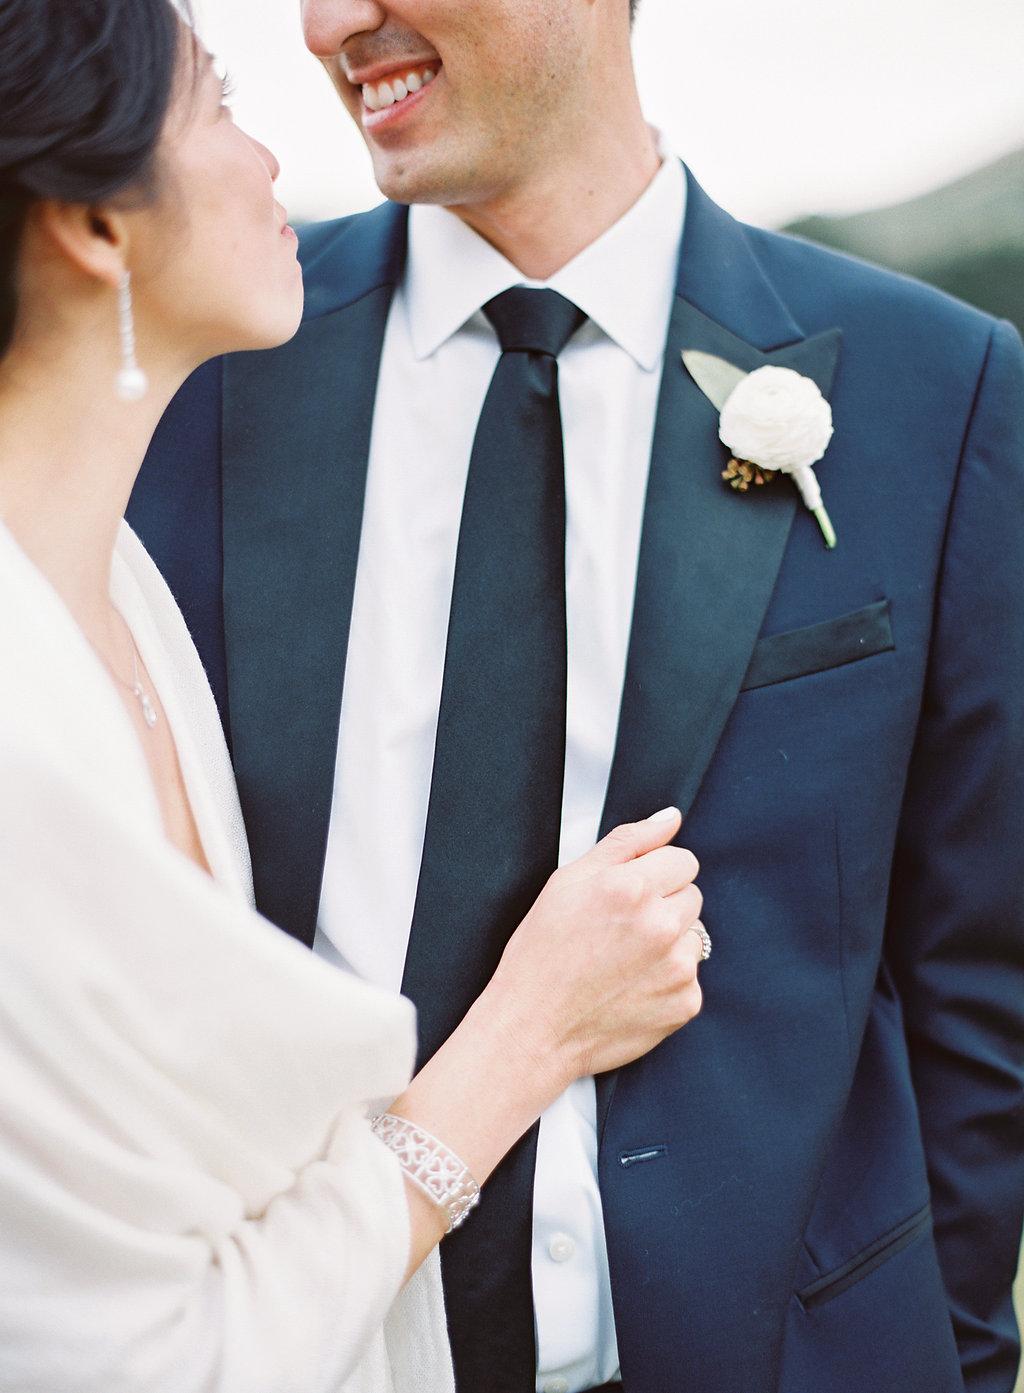 Cavallo-Point-Wedding-San-Francisco- Film-Photographer-607.jpg